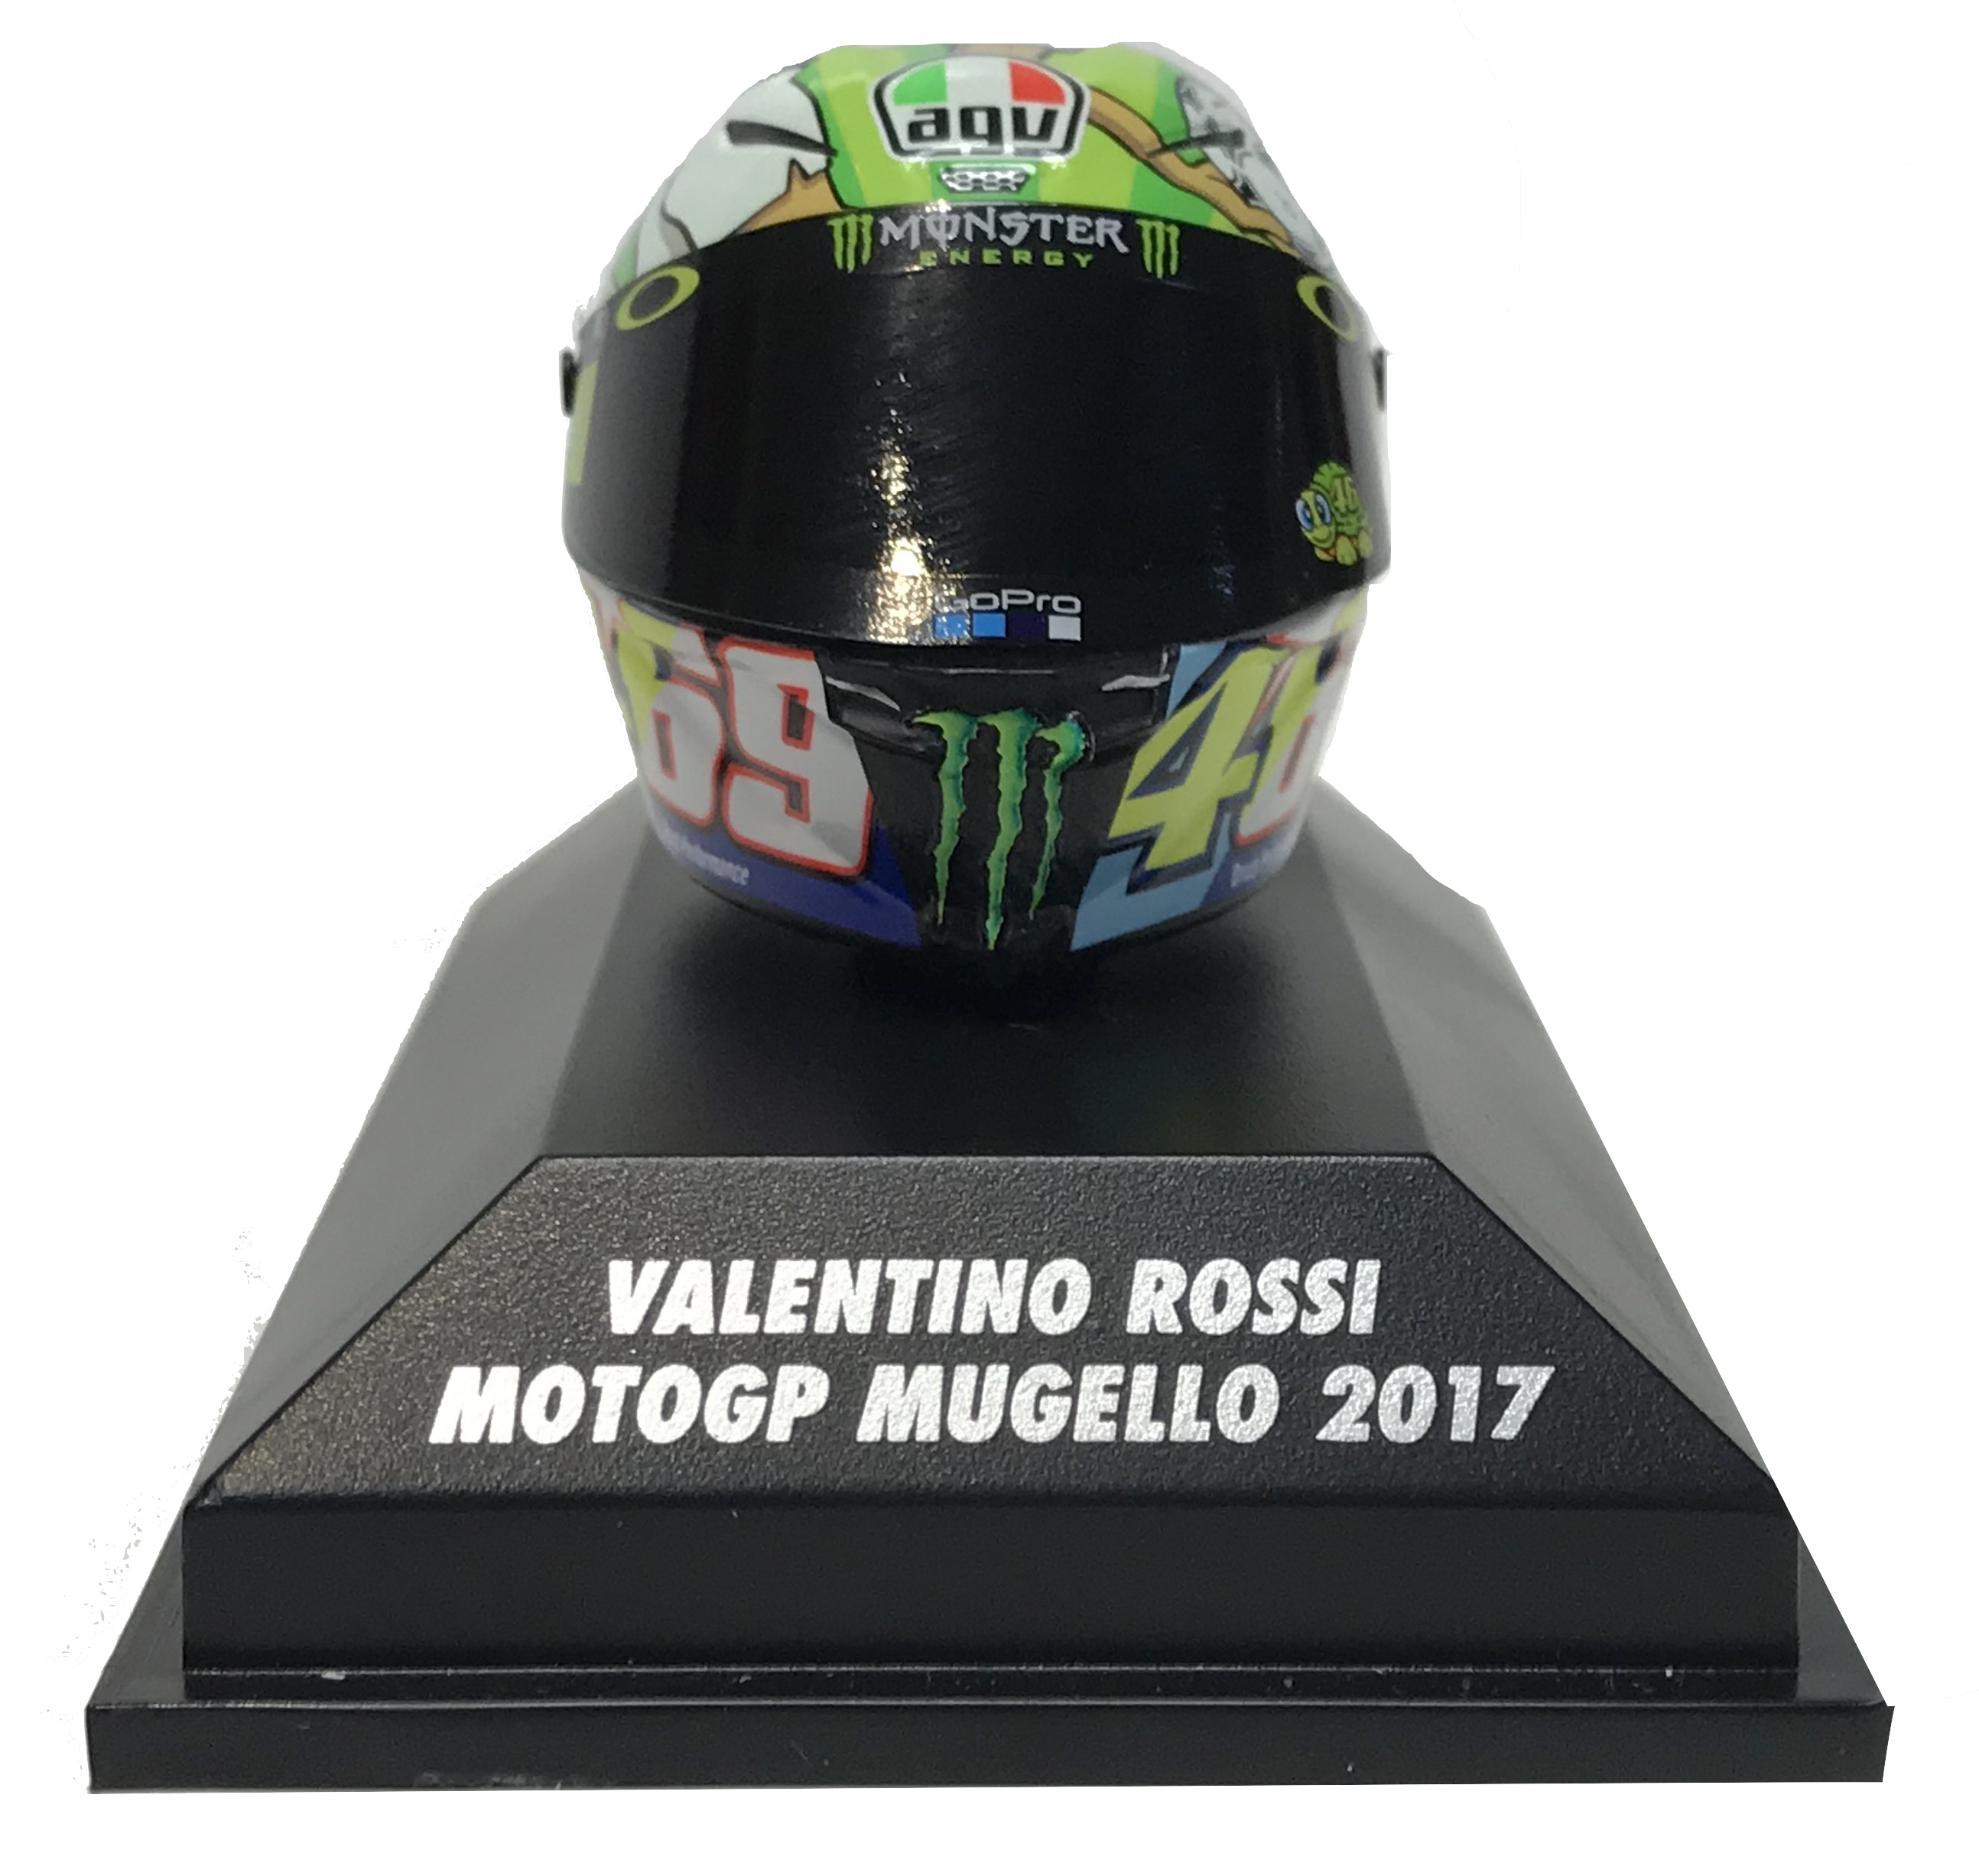 Valentino Rossi  Moto GP Mugello 2017 Helmet 1/8